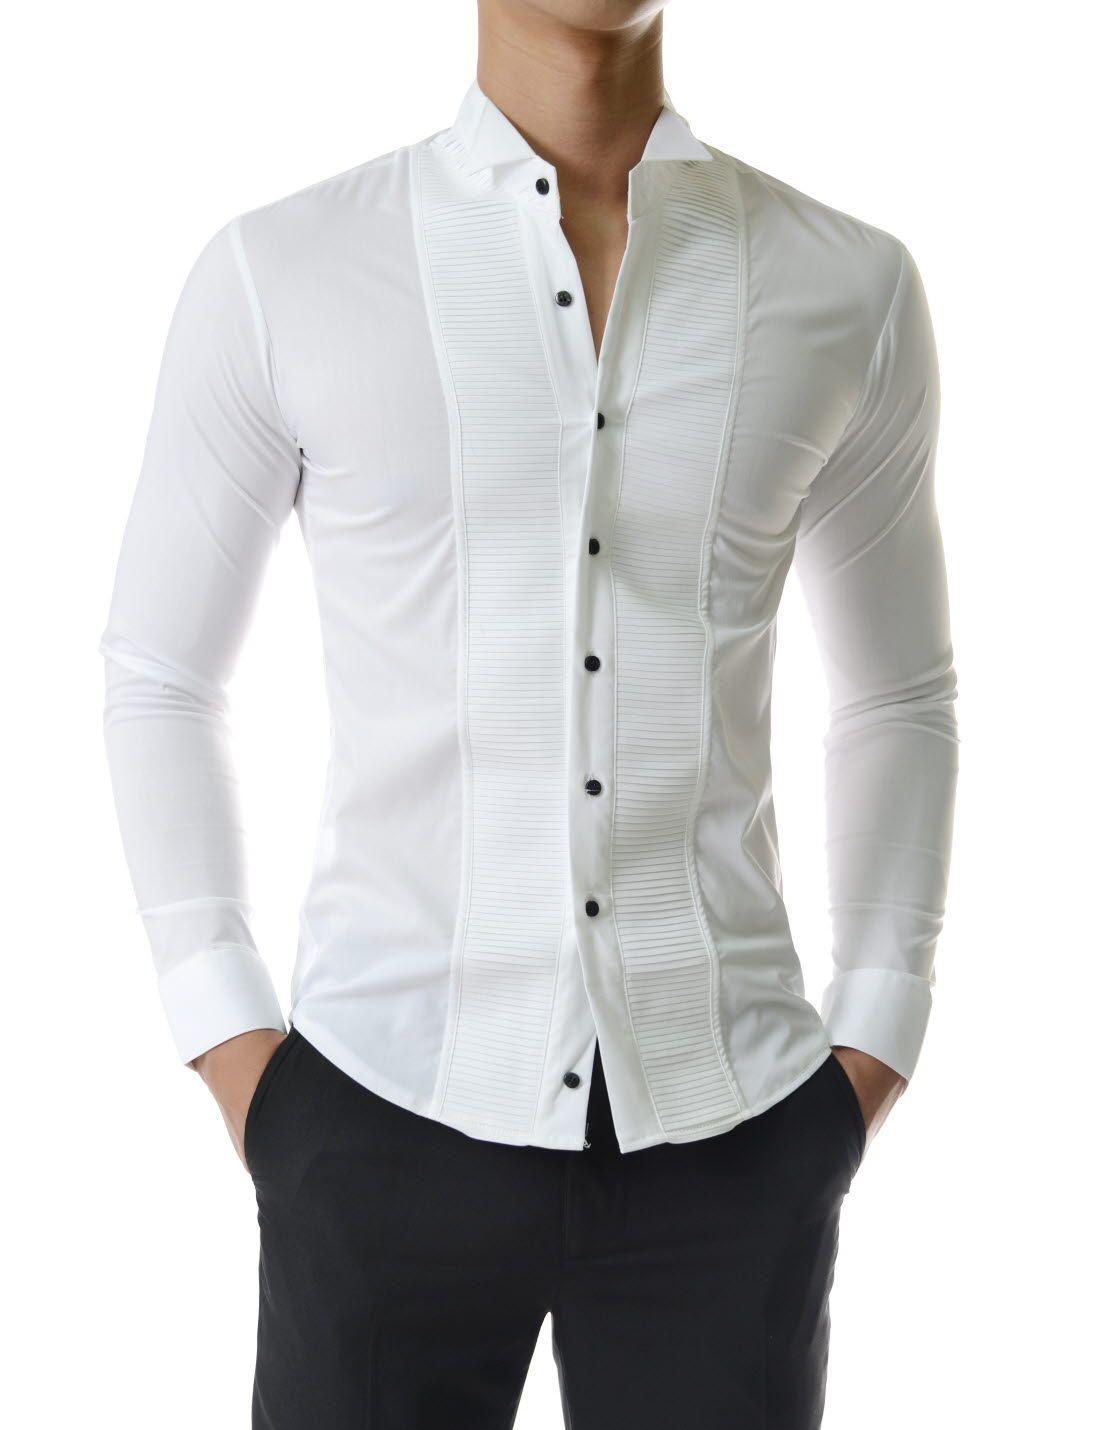 4c77bfa1826 Fashionable Tuxedo Slim Wing Collar Pintuck Long Sleeve Dress Shirts ...